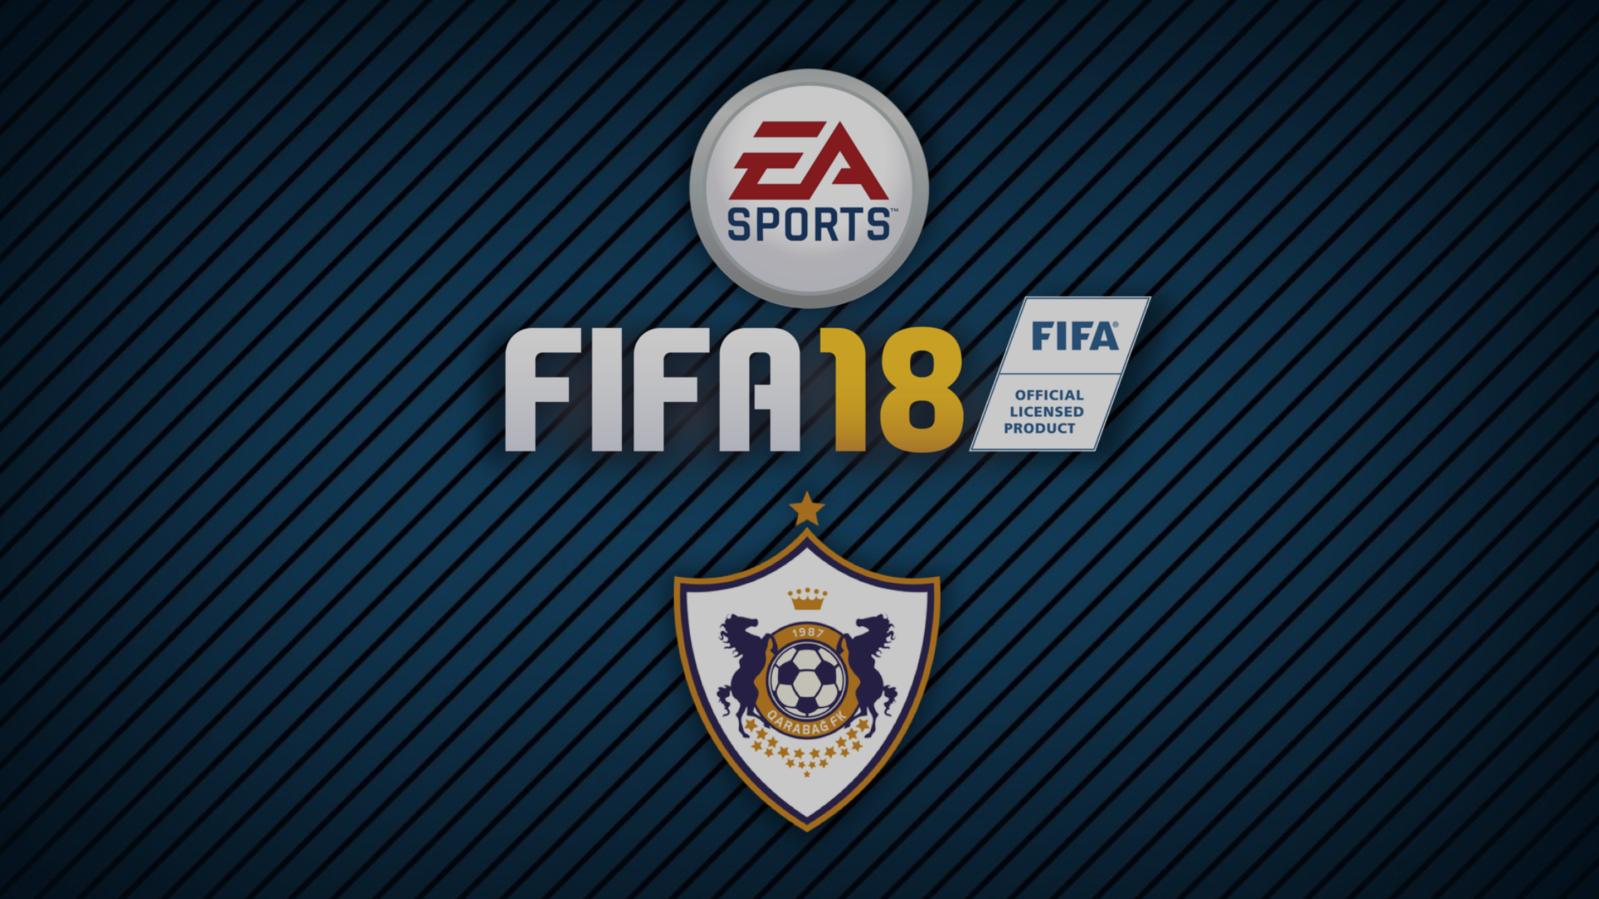 Petition ea games ea sports add qaraba fk to fifa 18 gameplay petition ea games ea sports add qaraba fk to fifa 18 gameplay change biocorpaavc